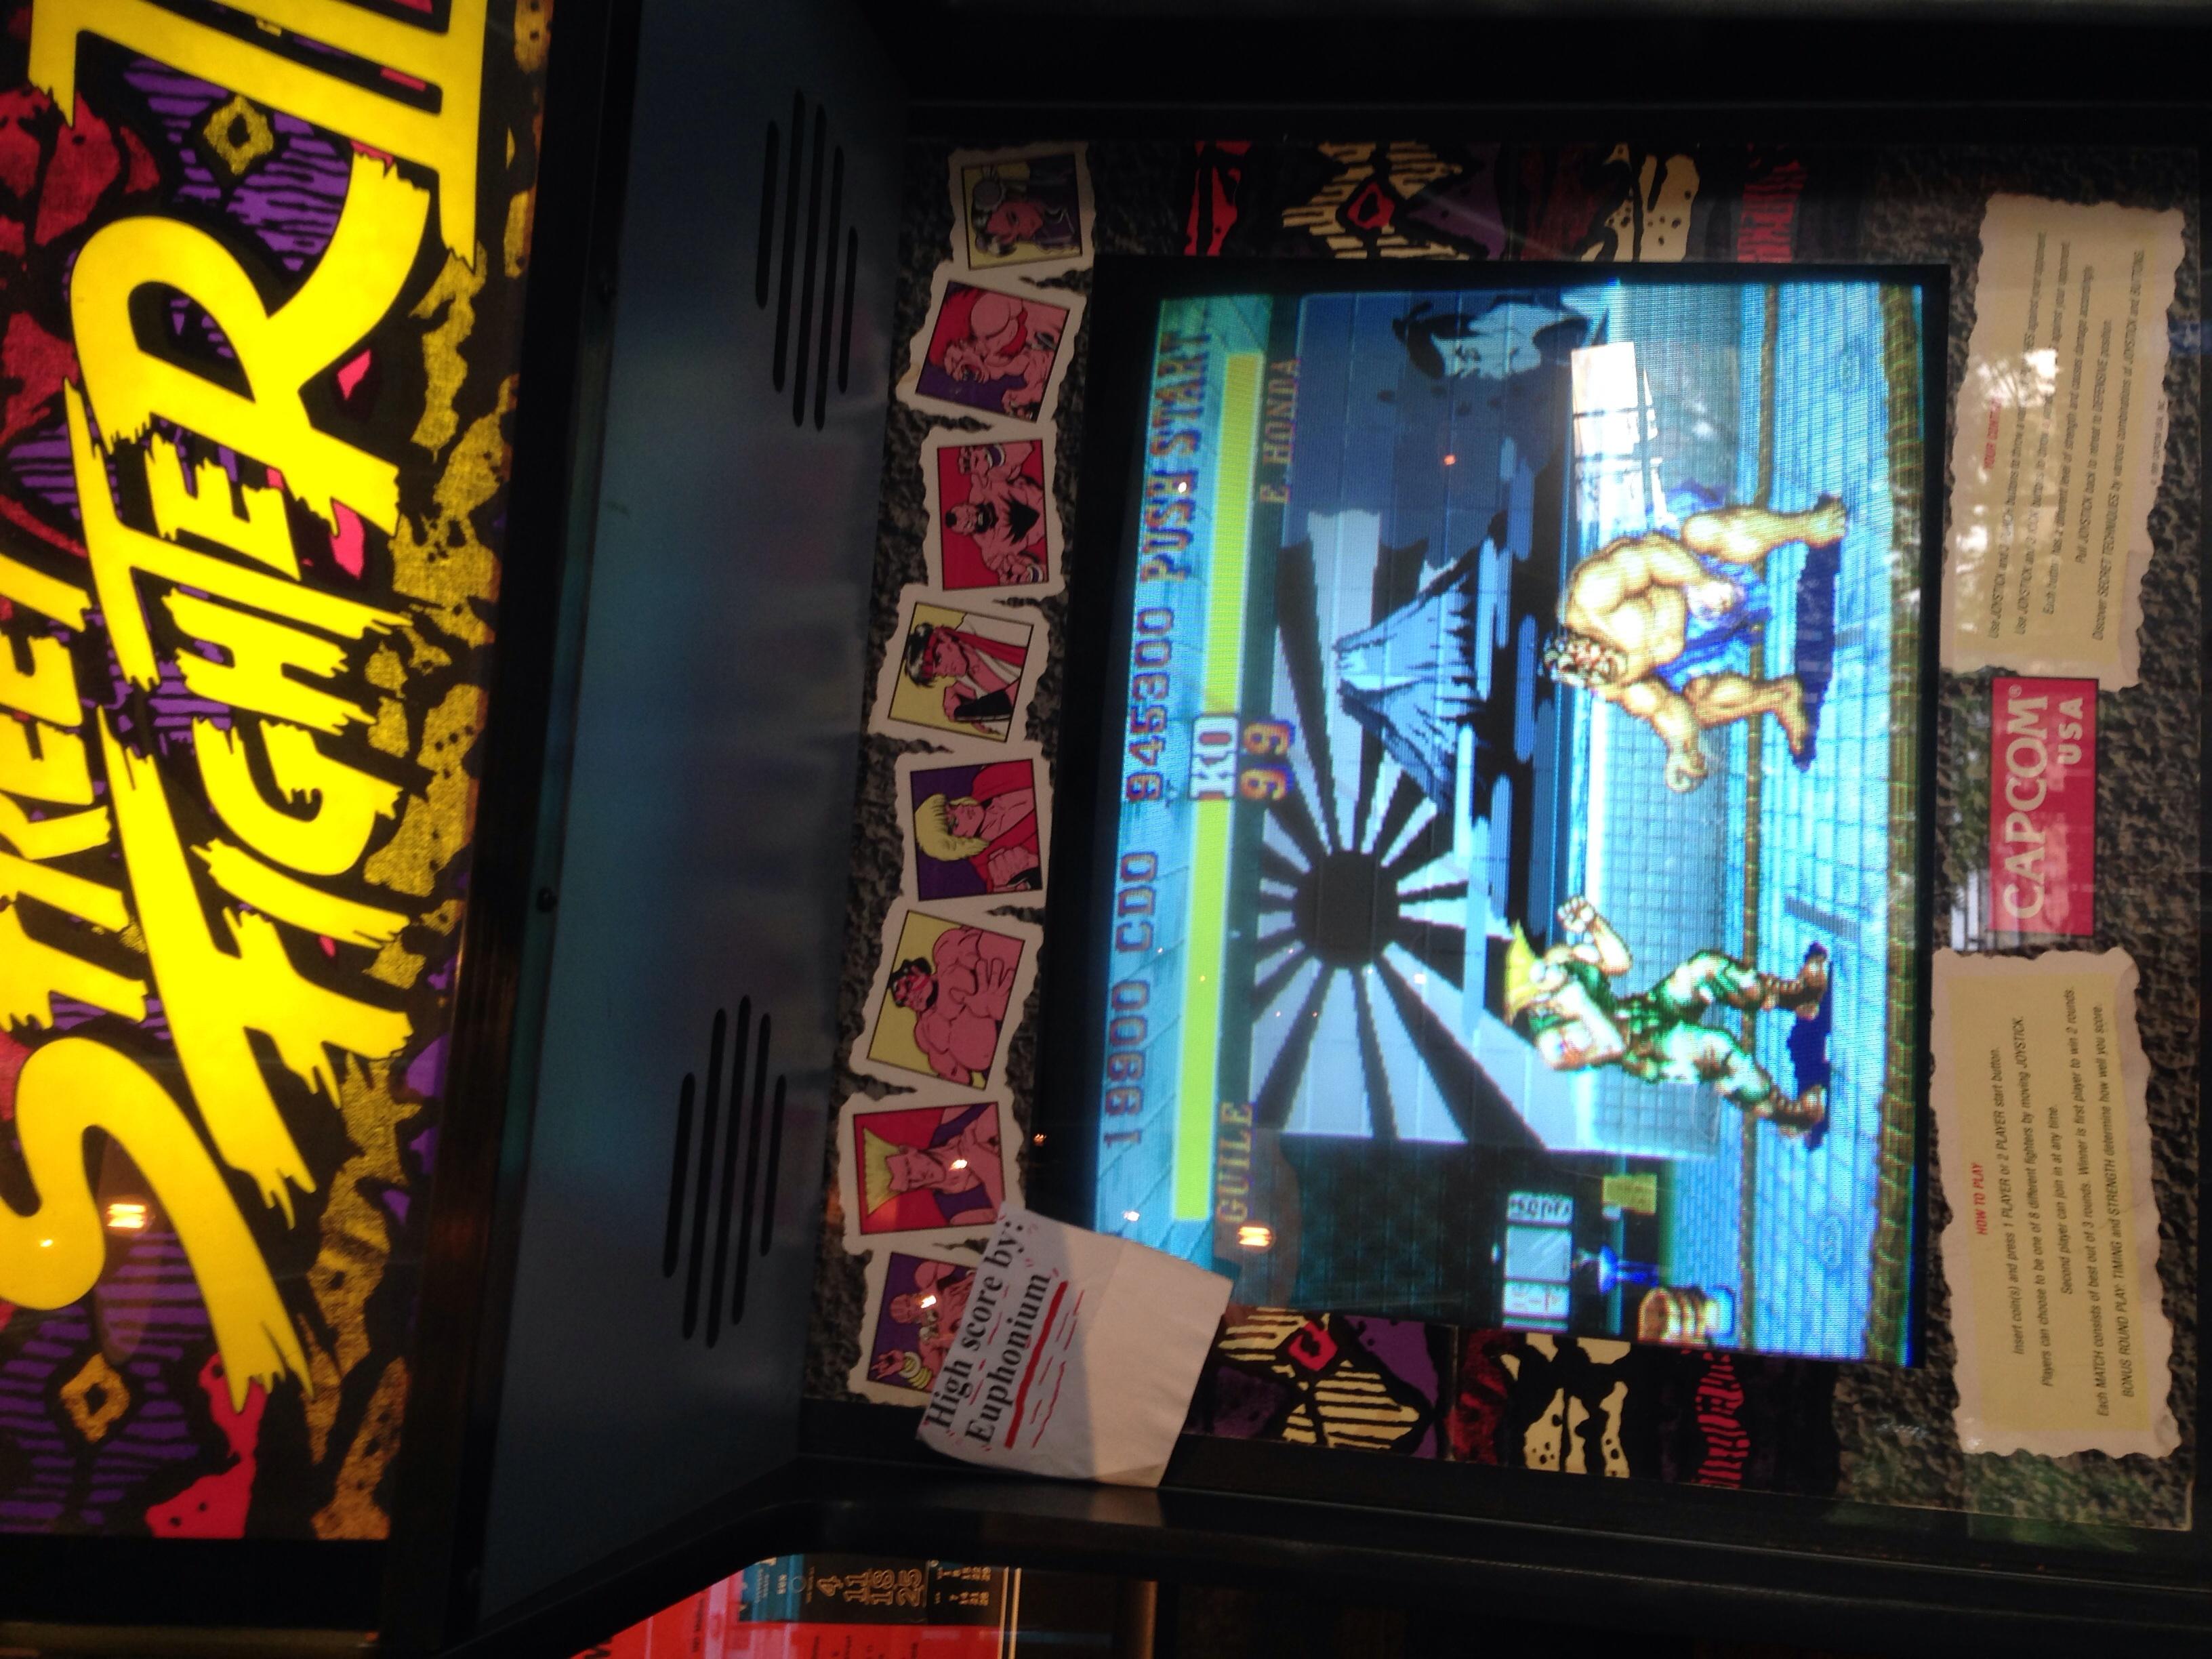 euphonium: Street Fighter II (Arcade) 19,900 points on 2016-06-22 00:48:34